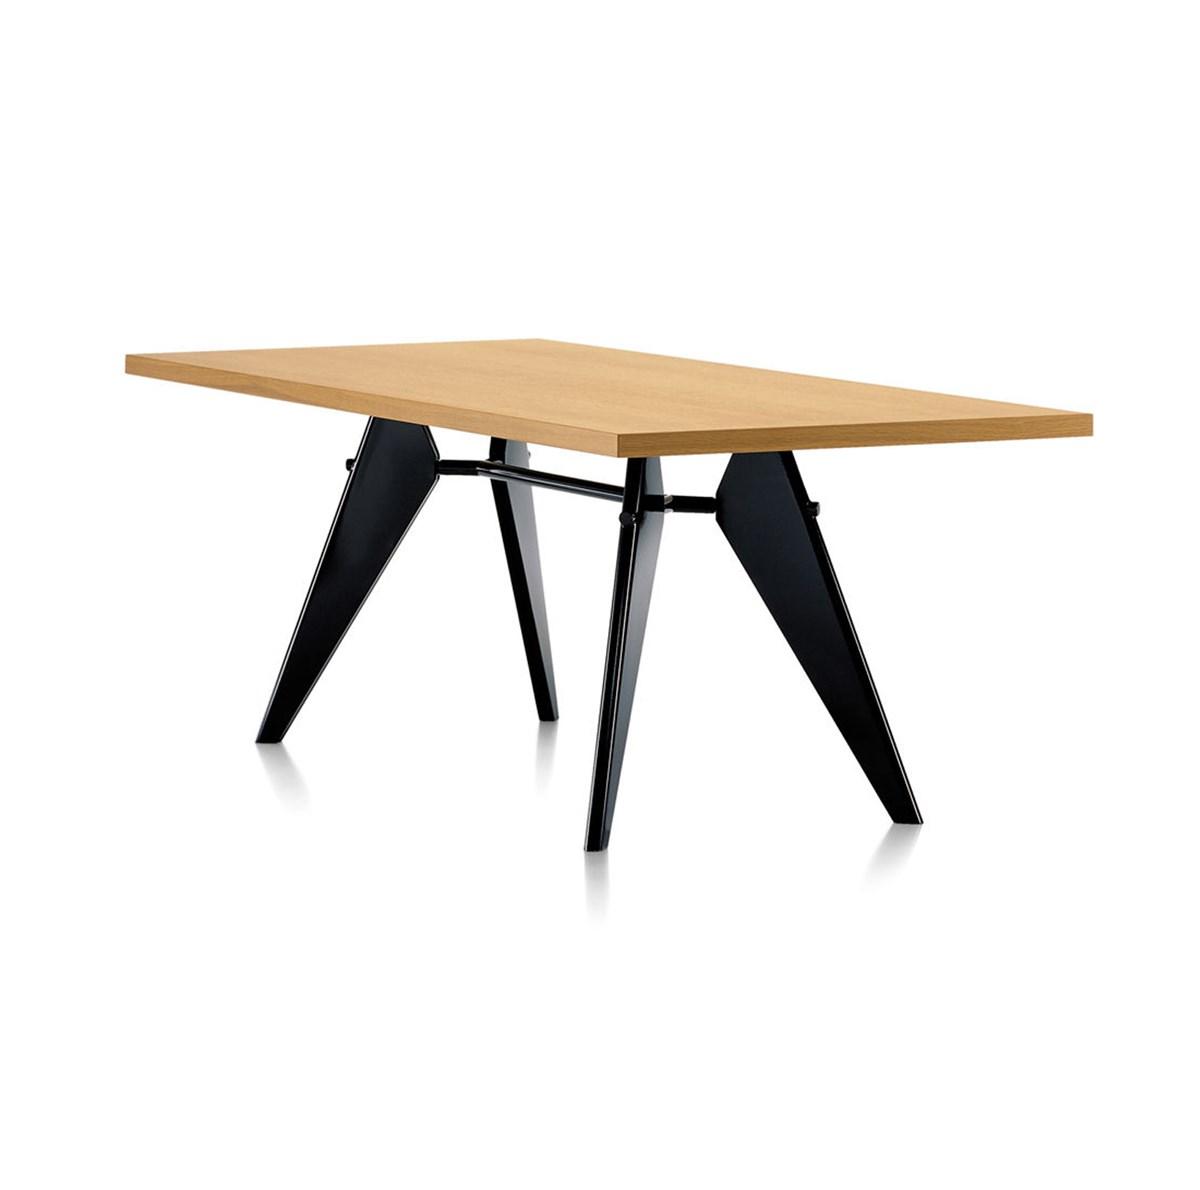 Vitra-Jean Prouvé-EM-Table-Matisse-1